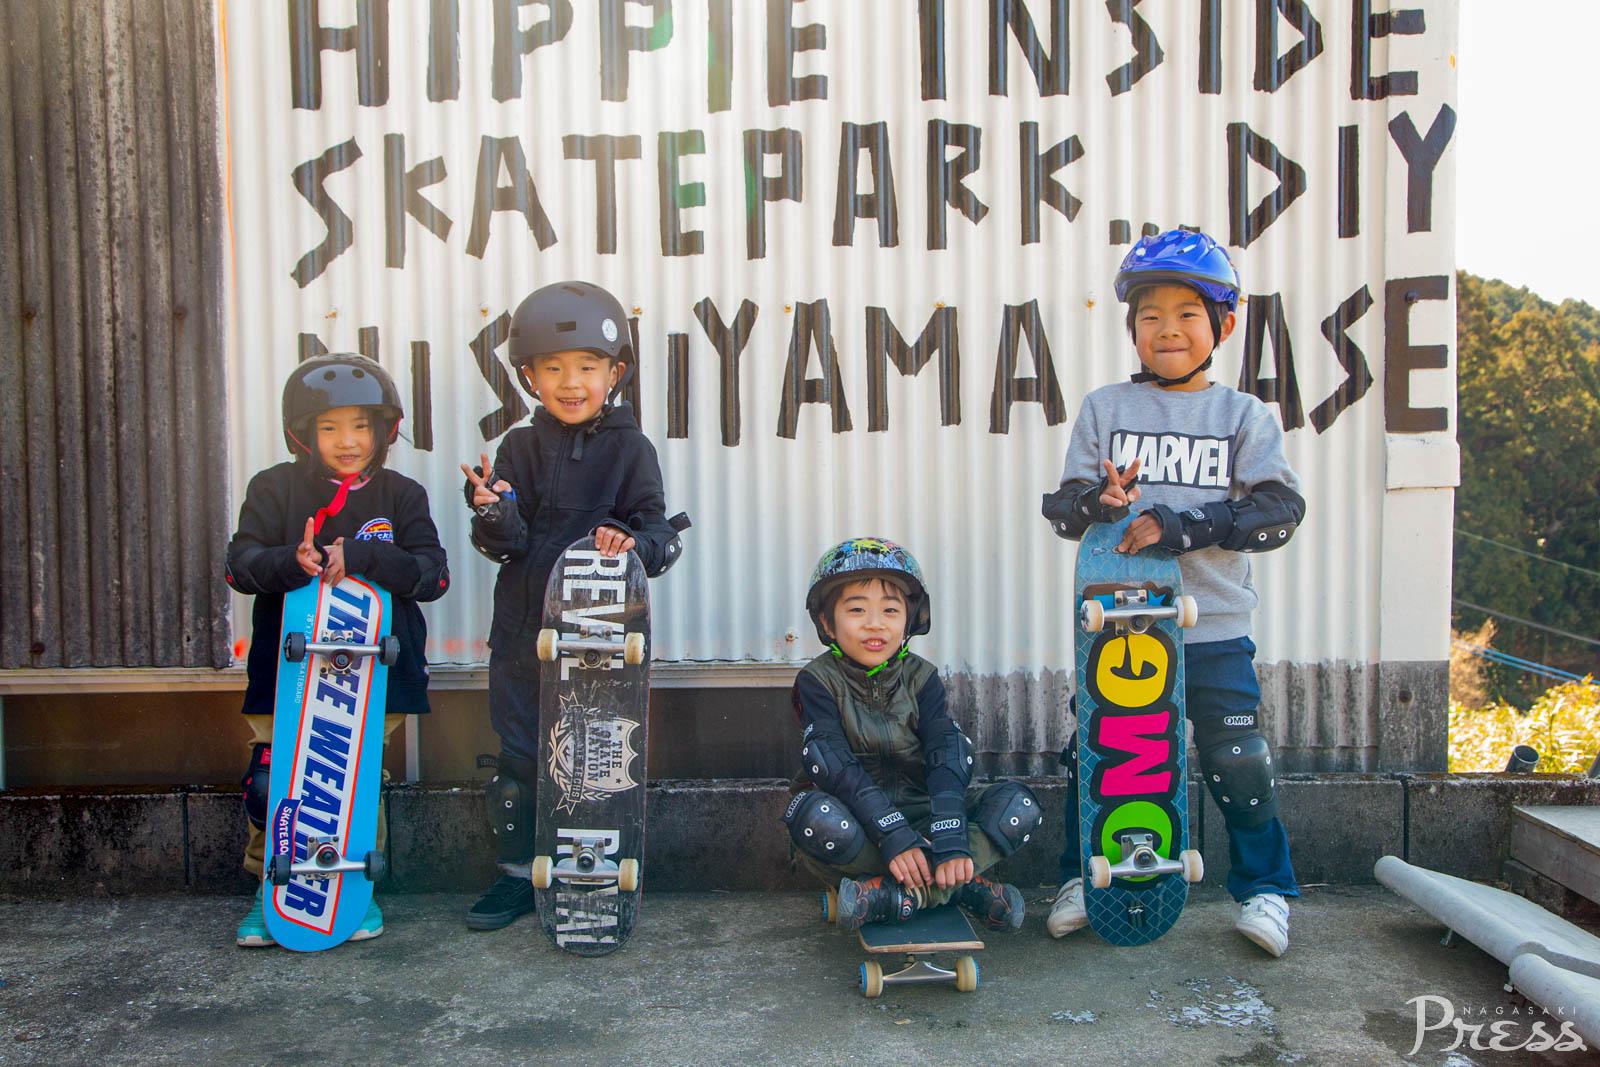 Hippieinside Skatepark DIY